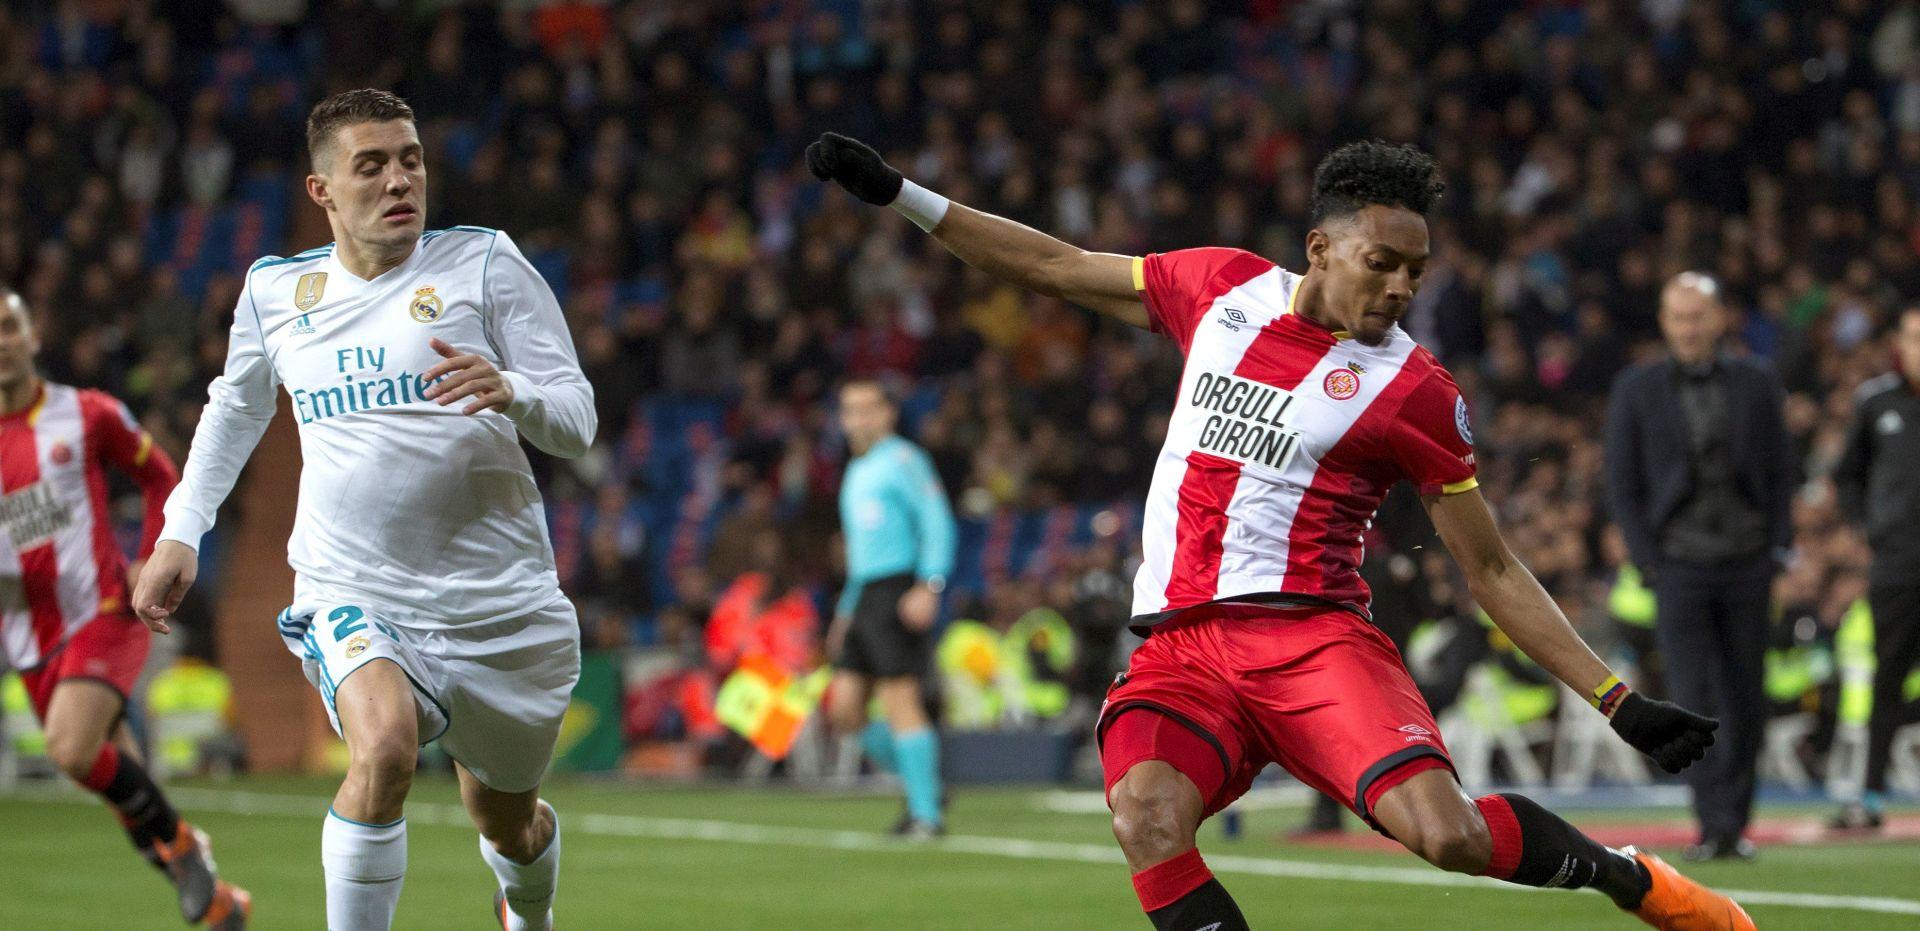 Četiri gola Ronalda u visokoj pobjedi Reala, poraz Atletica